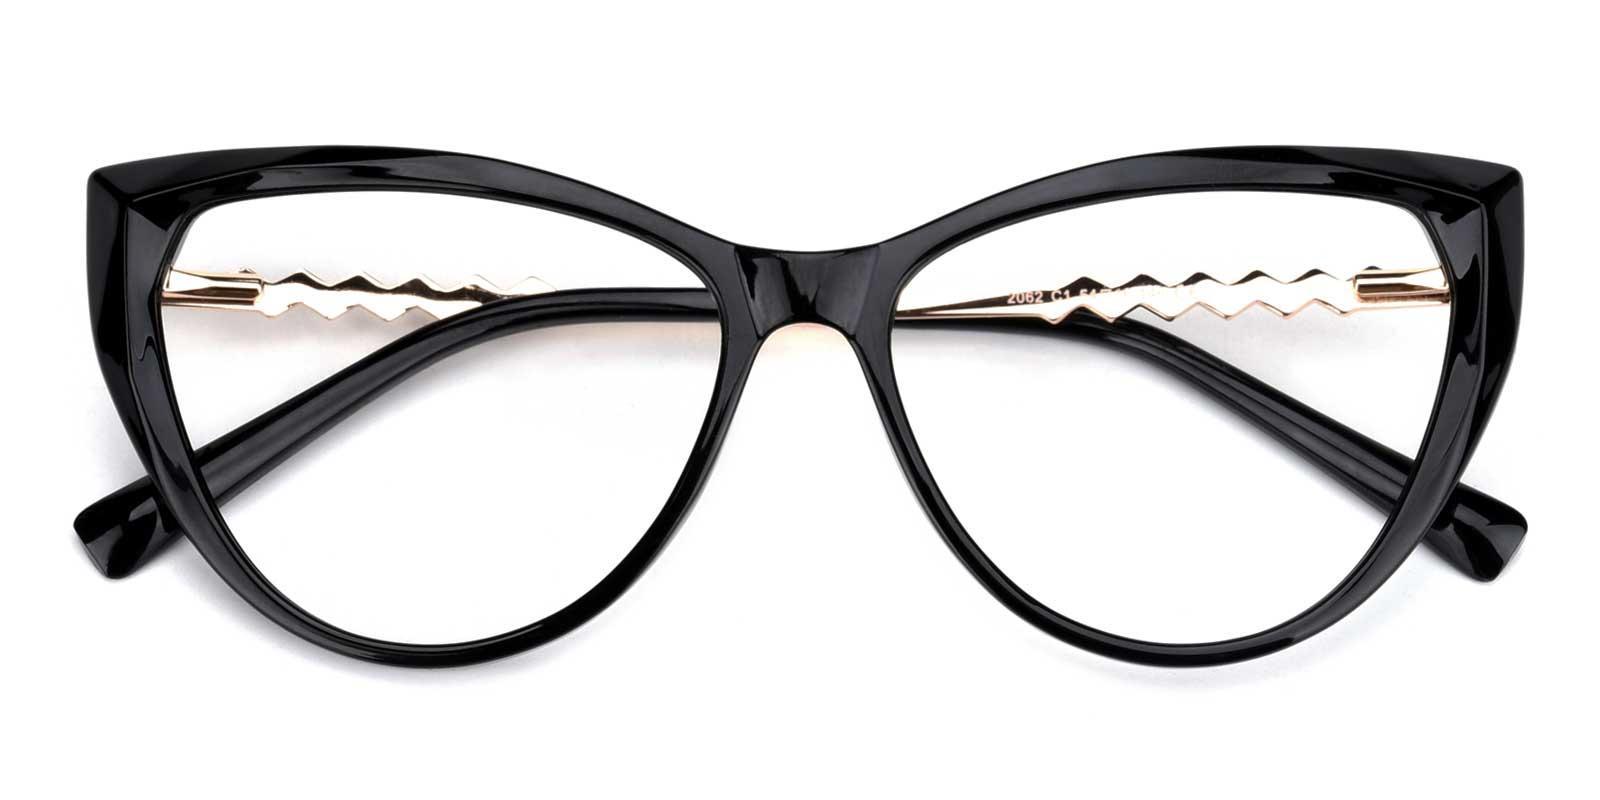 Daydream-Black-Cat-Acetate-Eyeglasses-detail